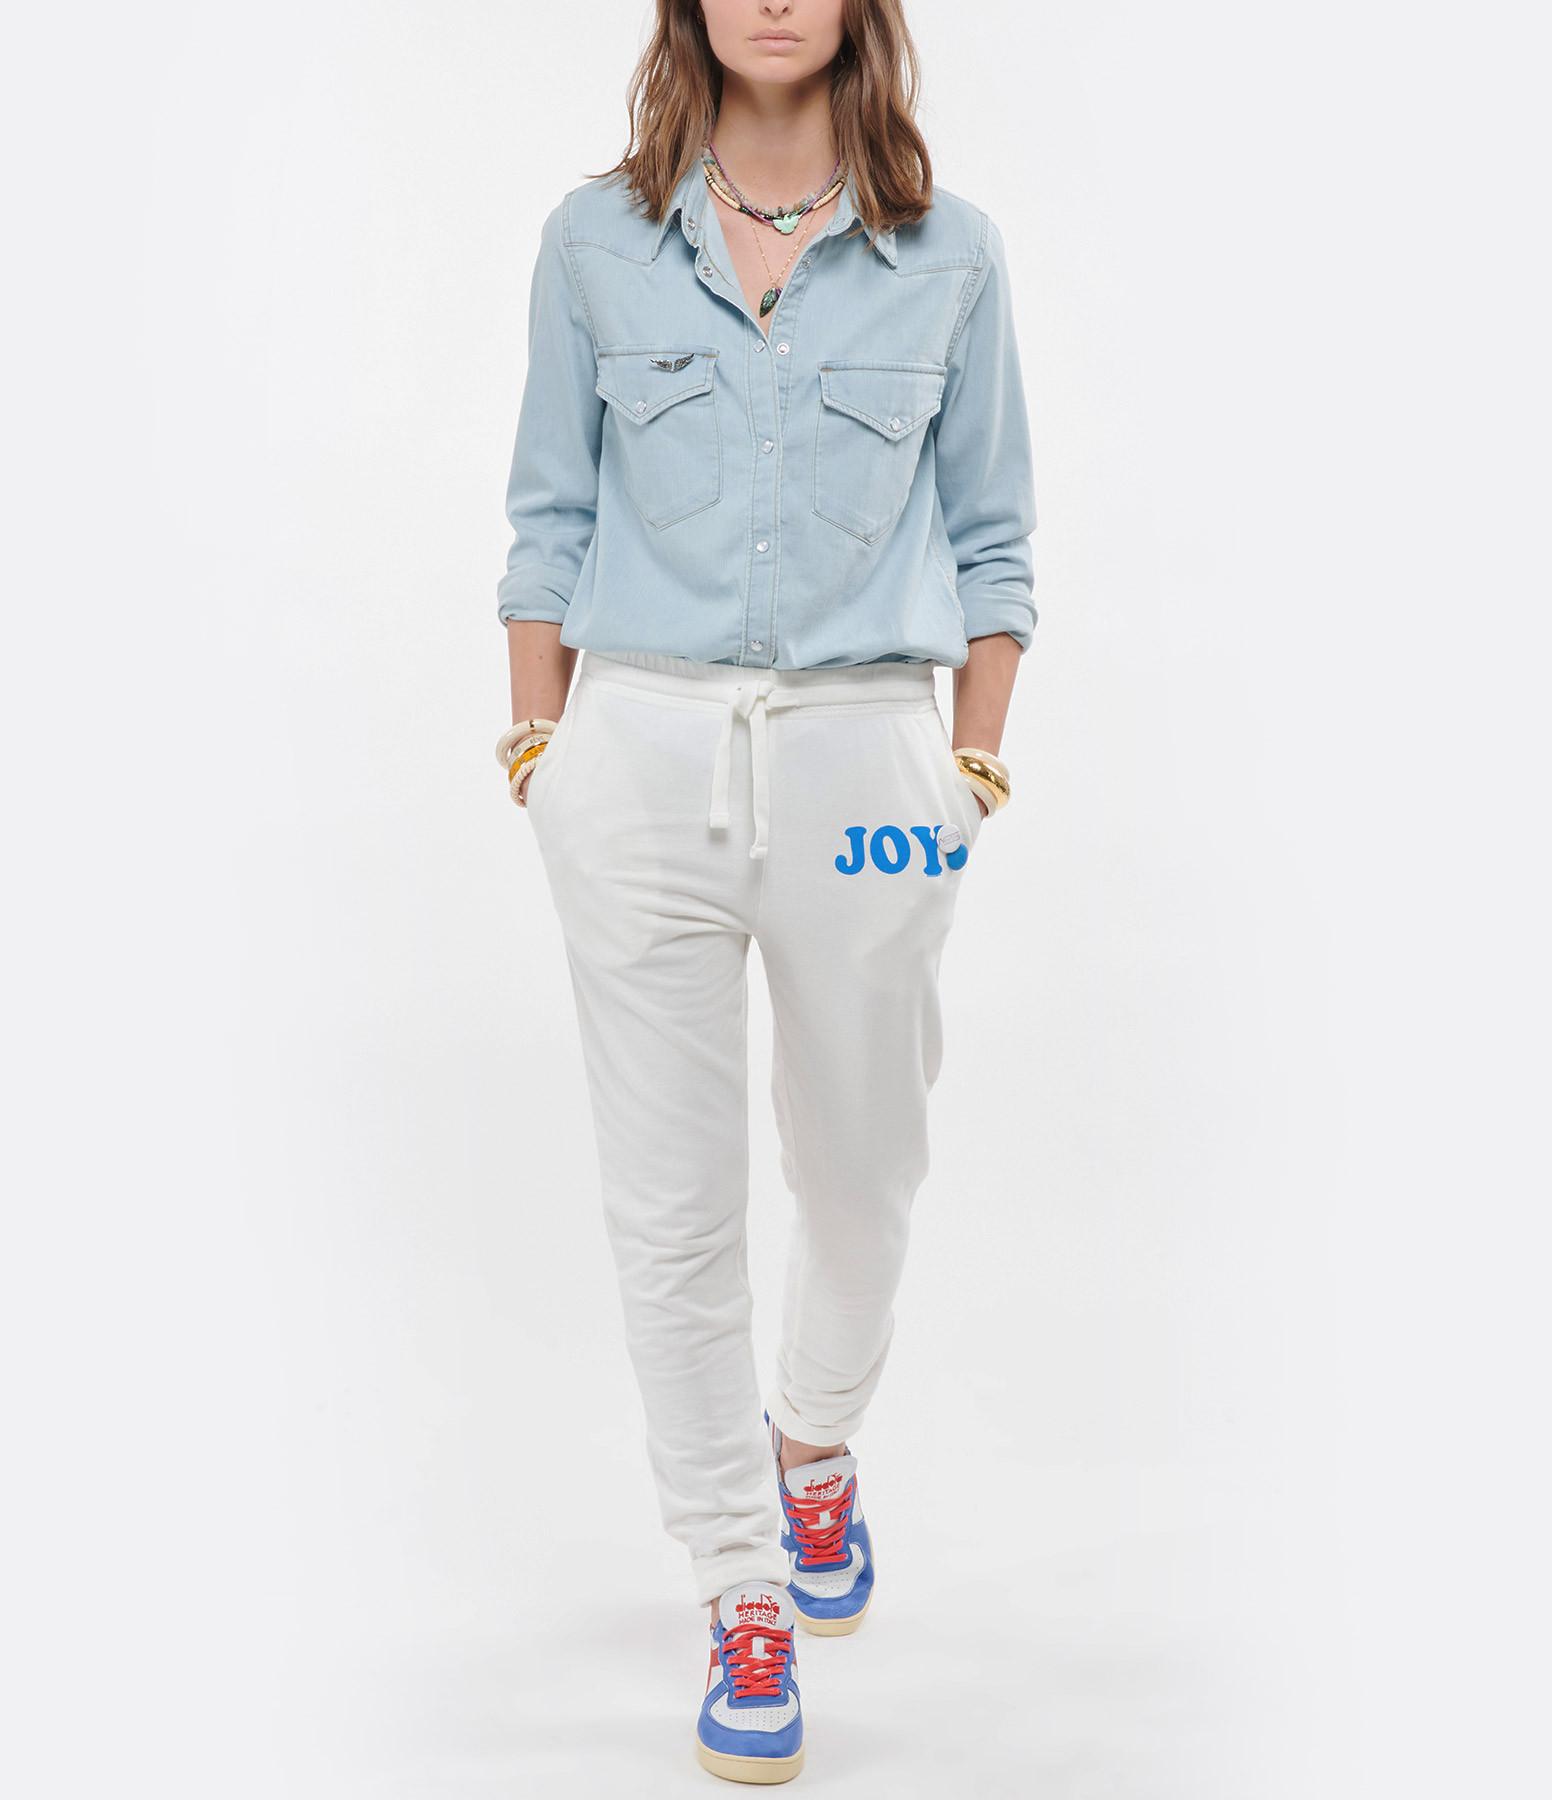 NEWTONE - Jogging Joy Coton Écru